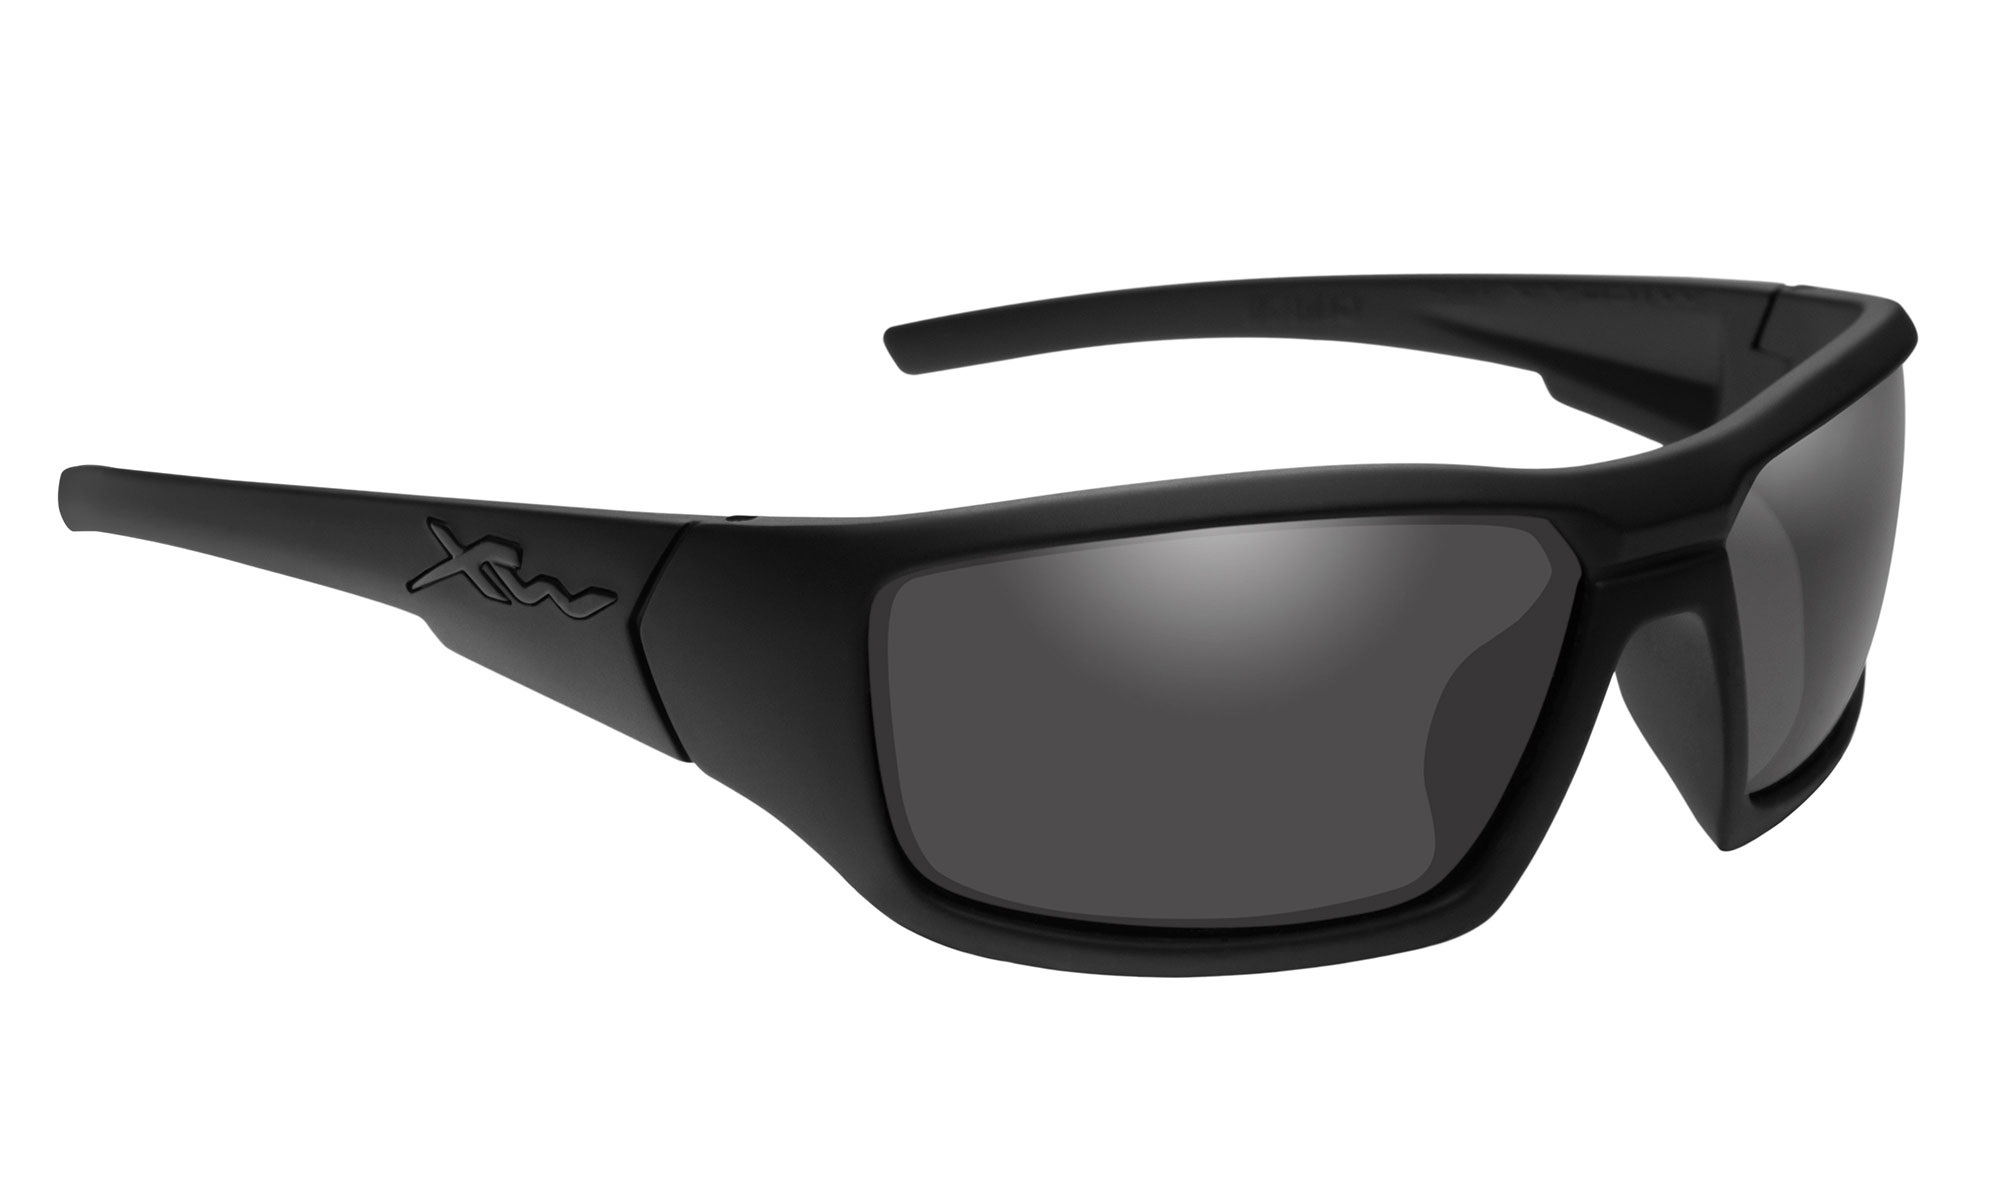 6c0d61557d95 Wiley X Sunglasses | Huge Selection | Best Prices » Bikershades